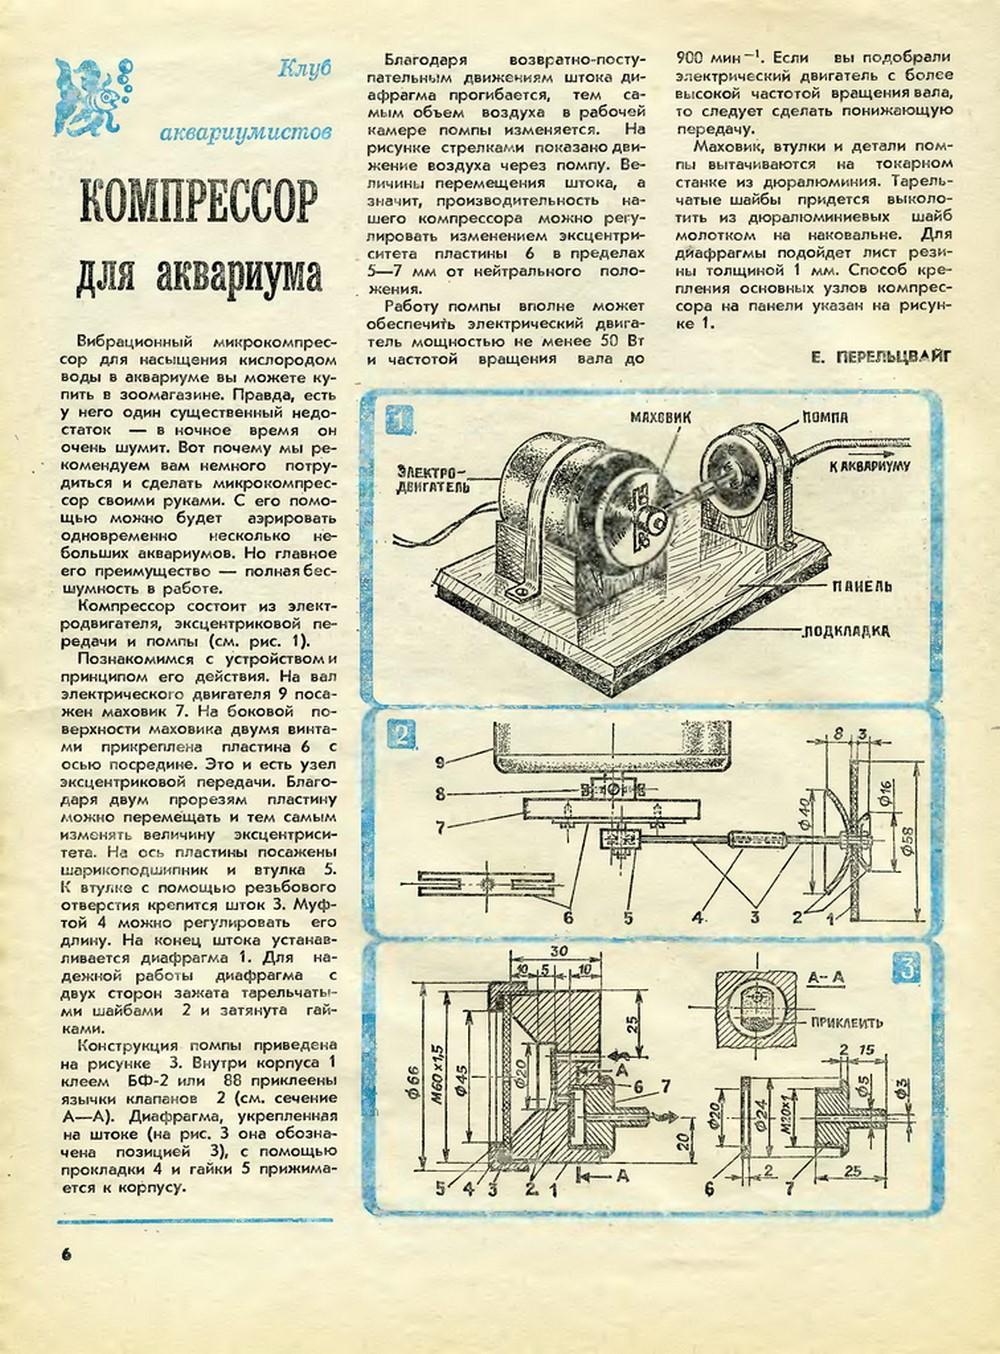 Помпа для компрессора аквариума своими руками